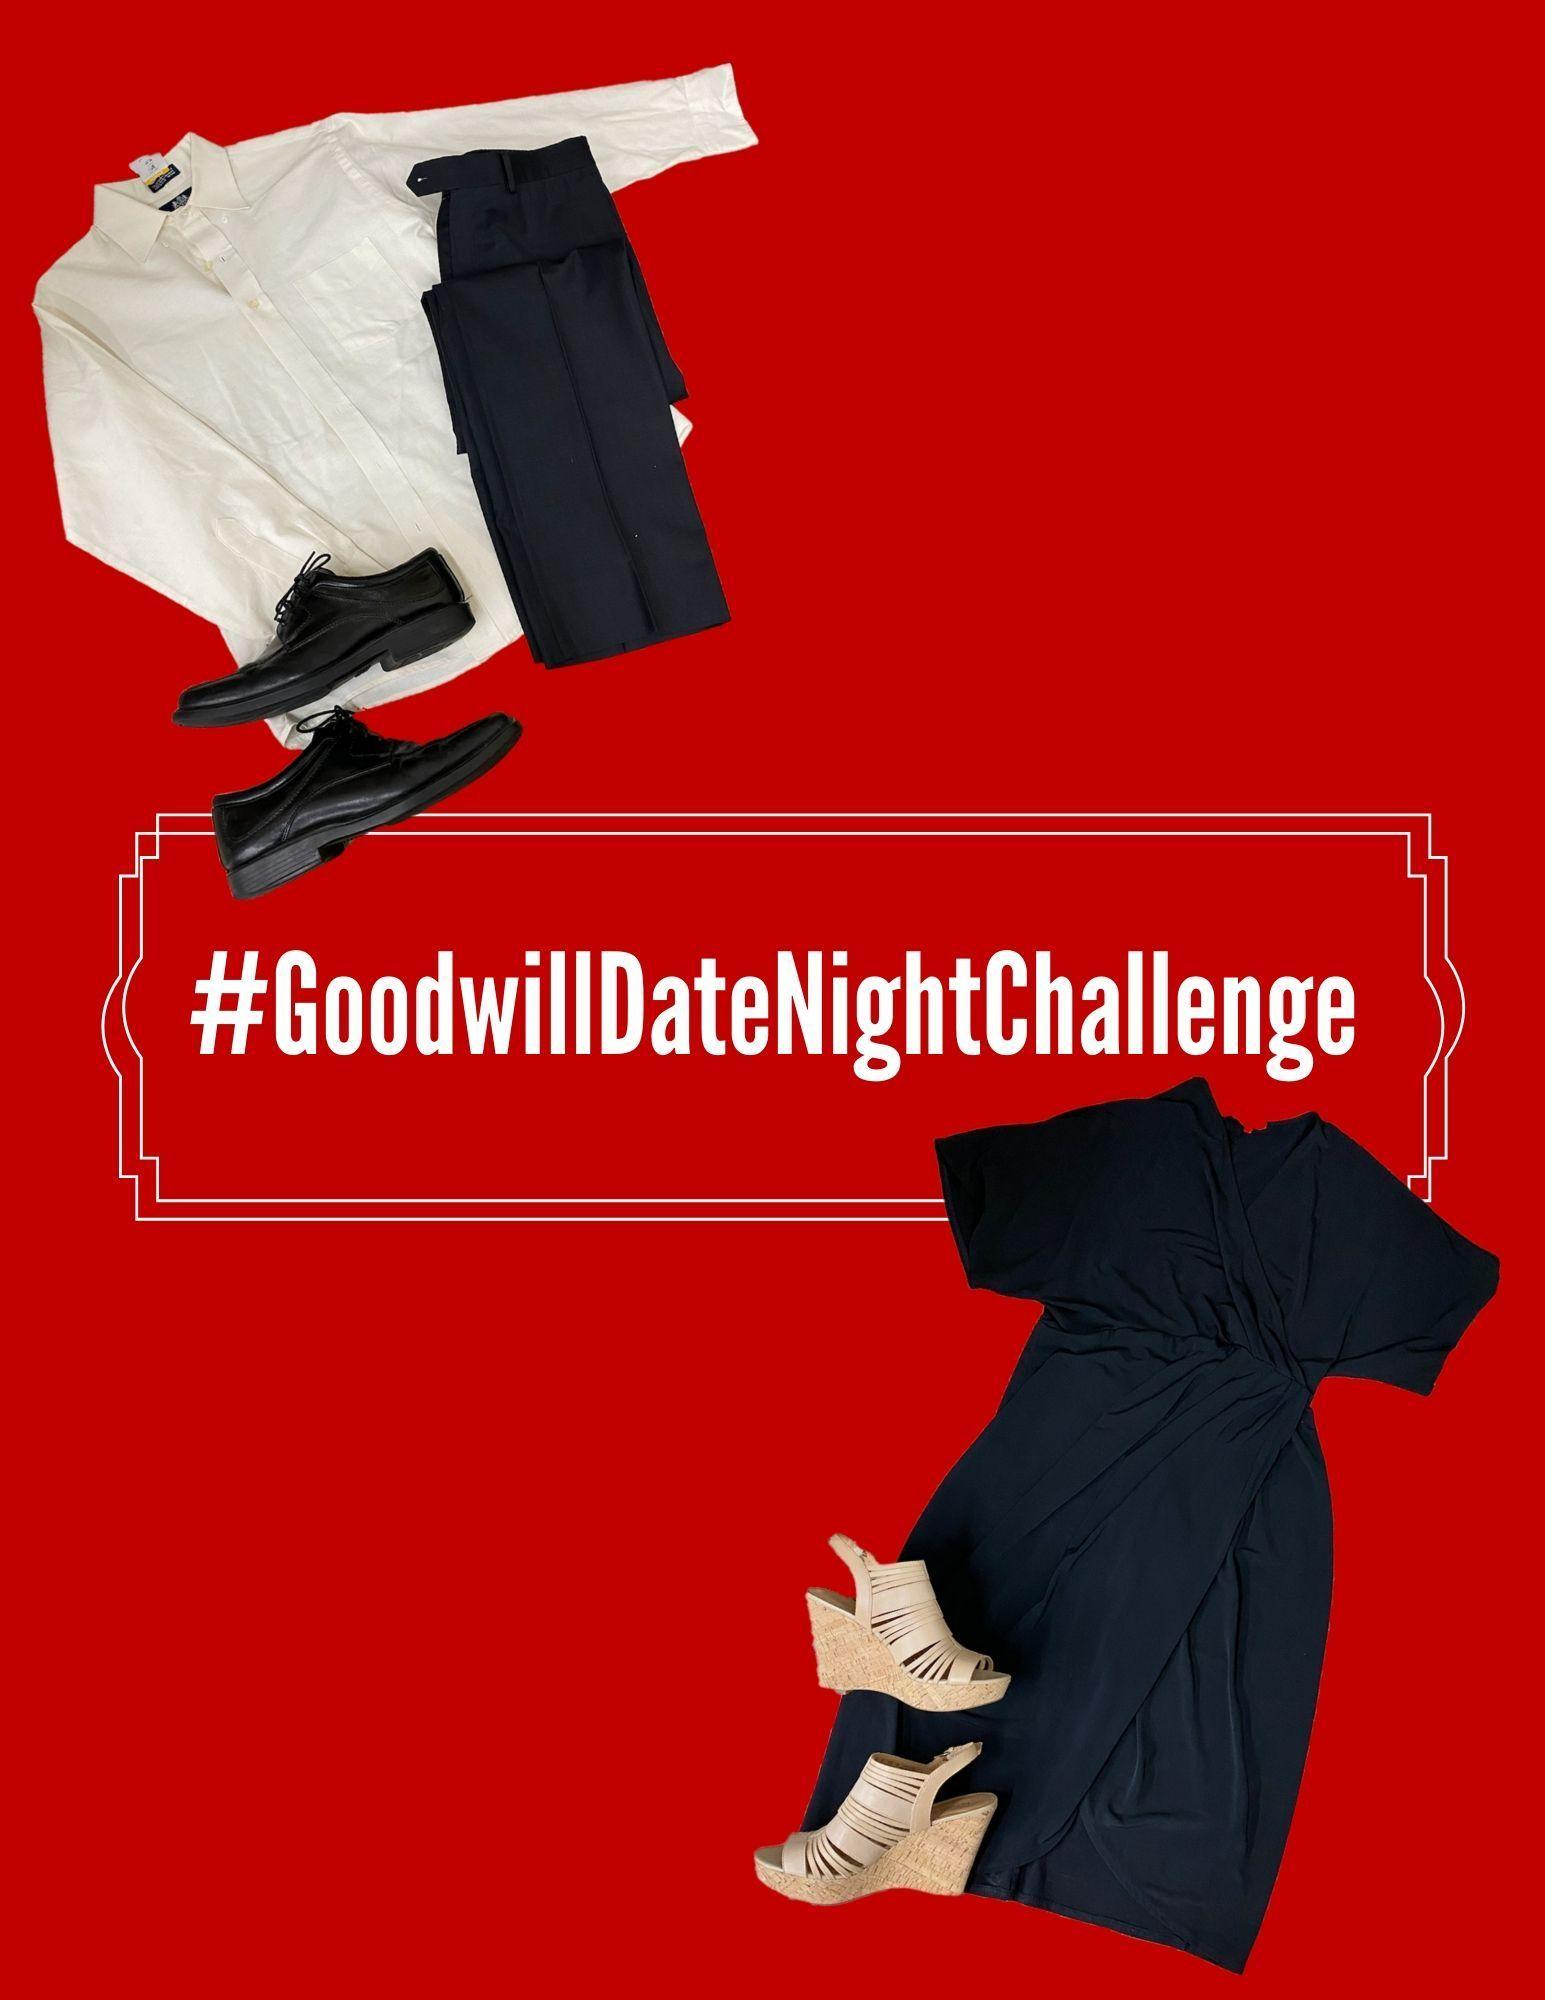 Goodwill Date Night Challengechallenge